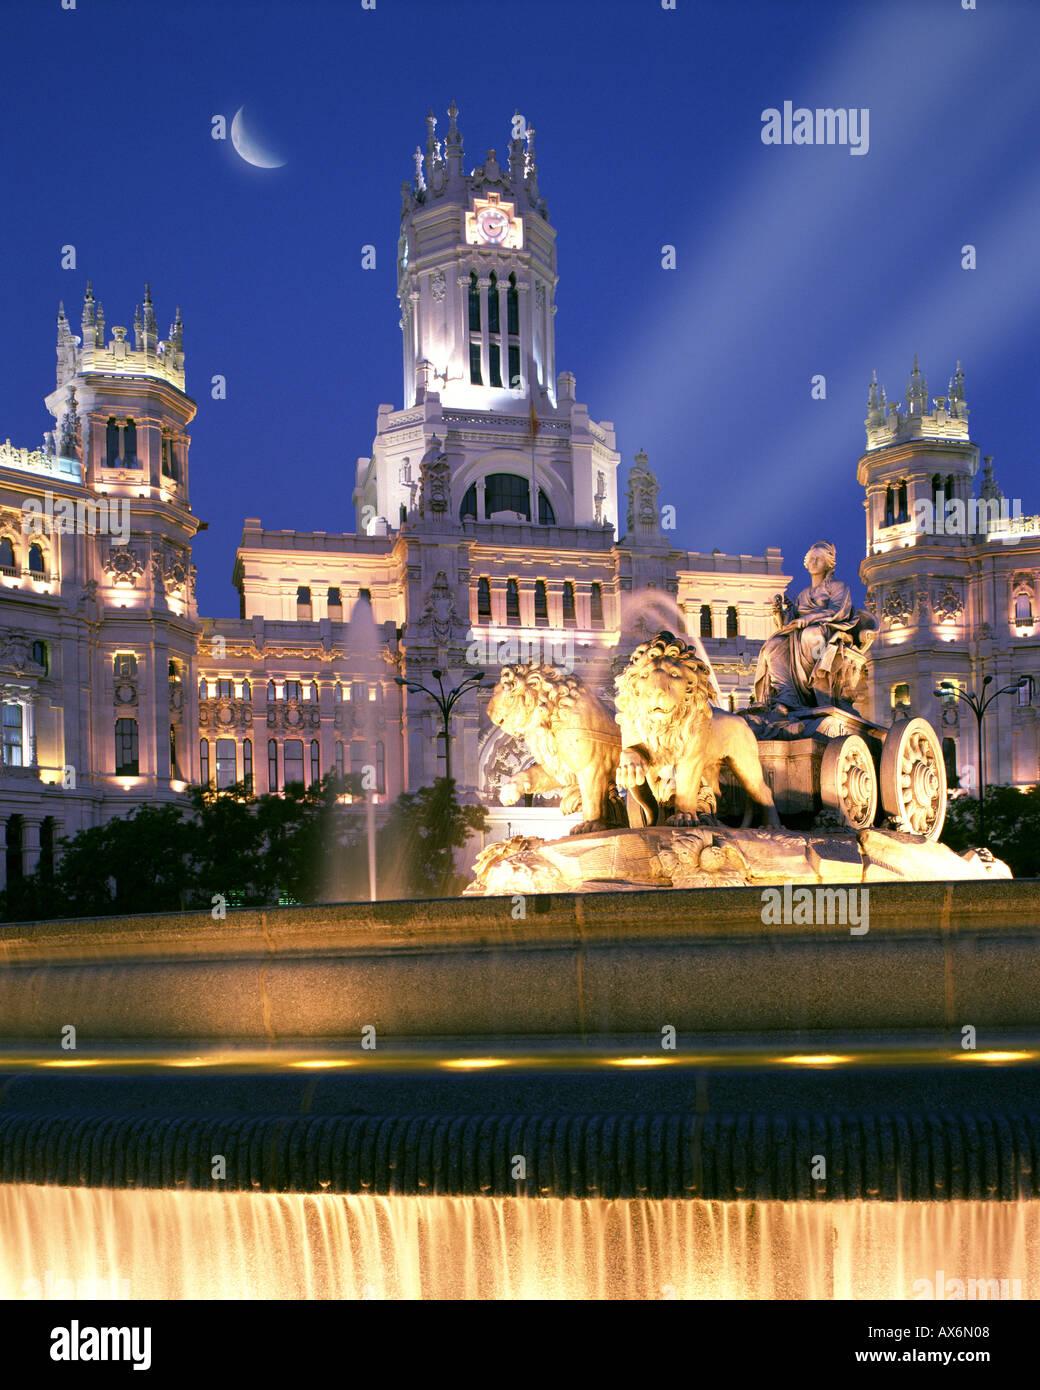 ES - MADRID: Plaza de Cibeles Stockbild